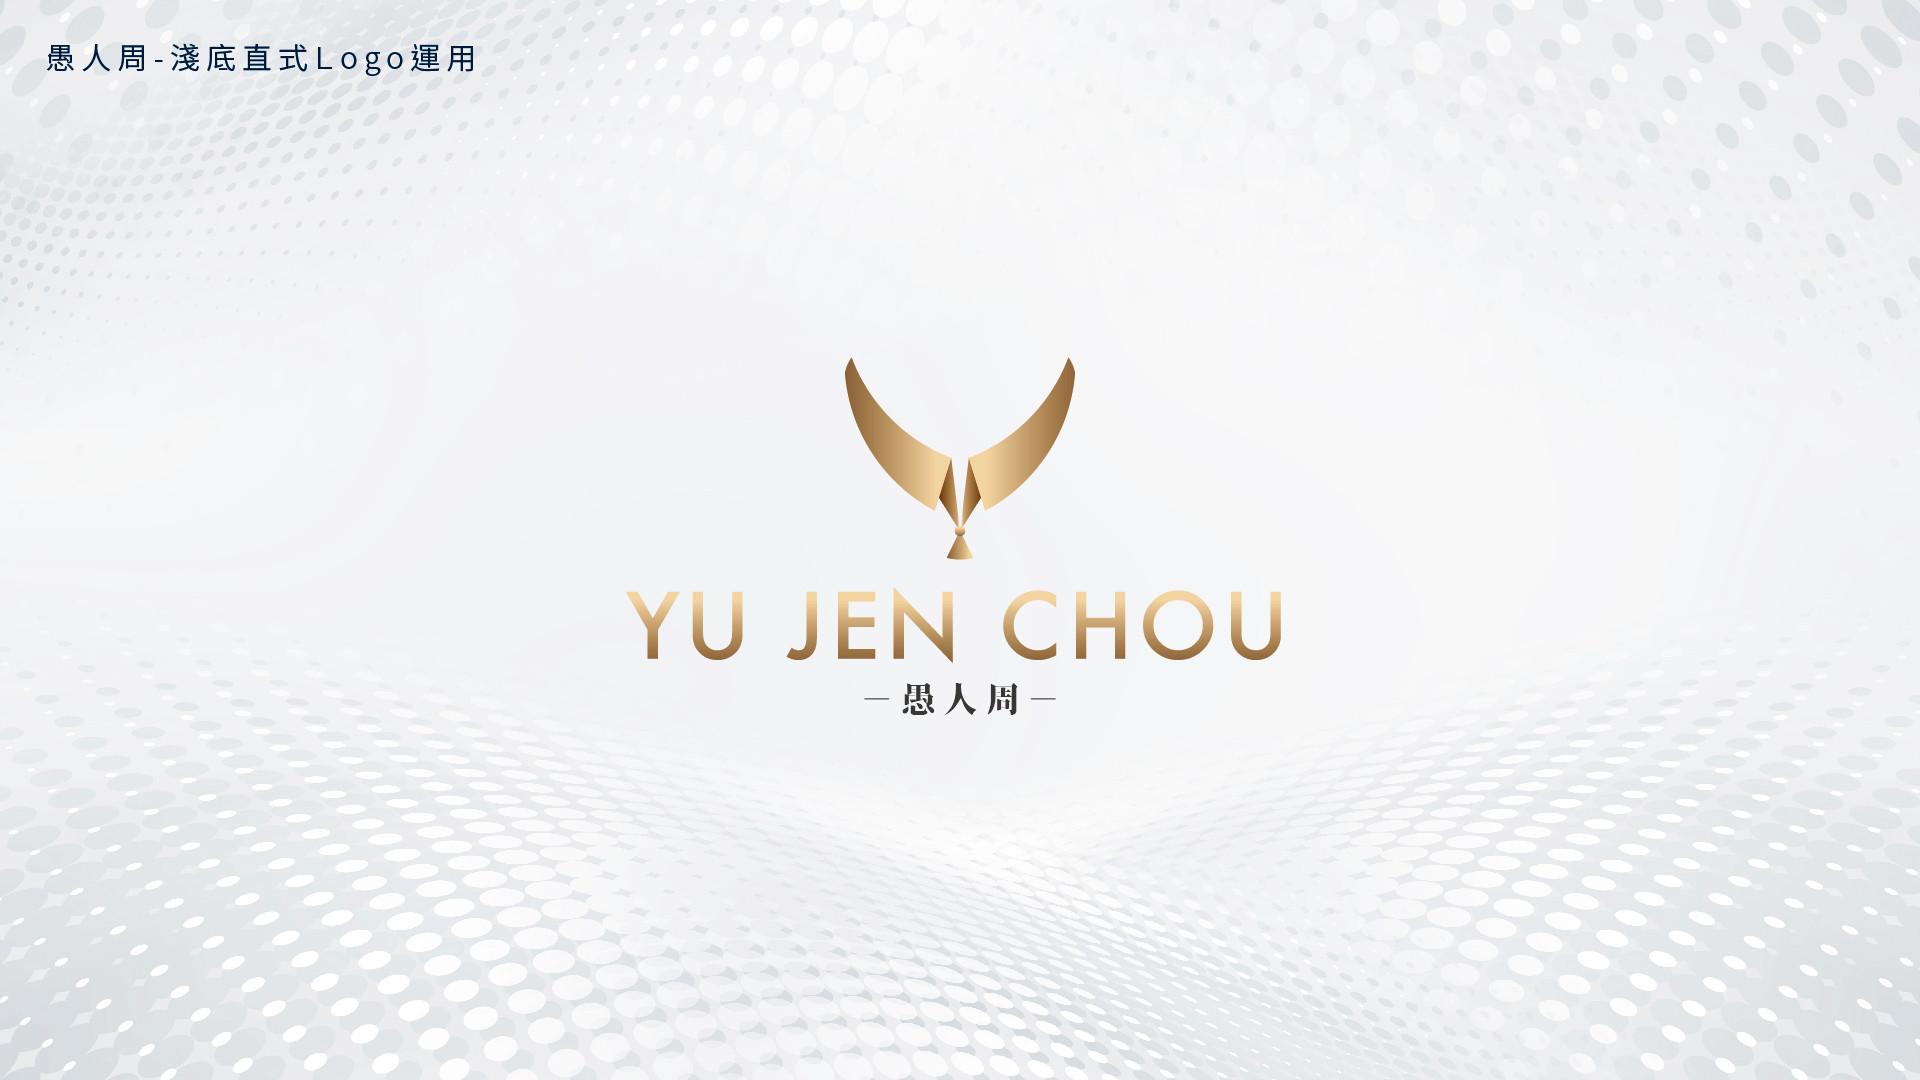 愚人周-Logo-2整-08.jpg